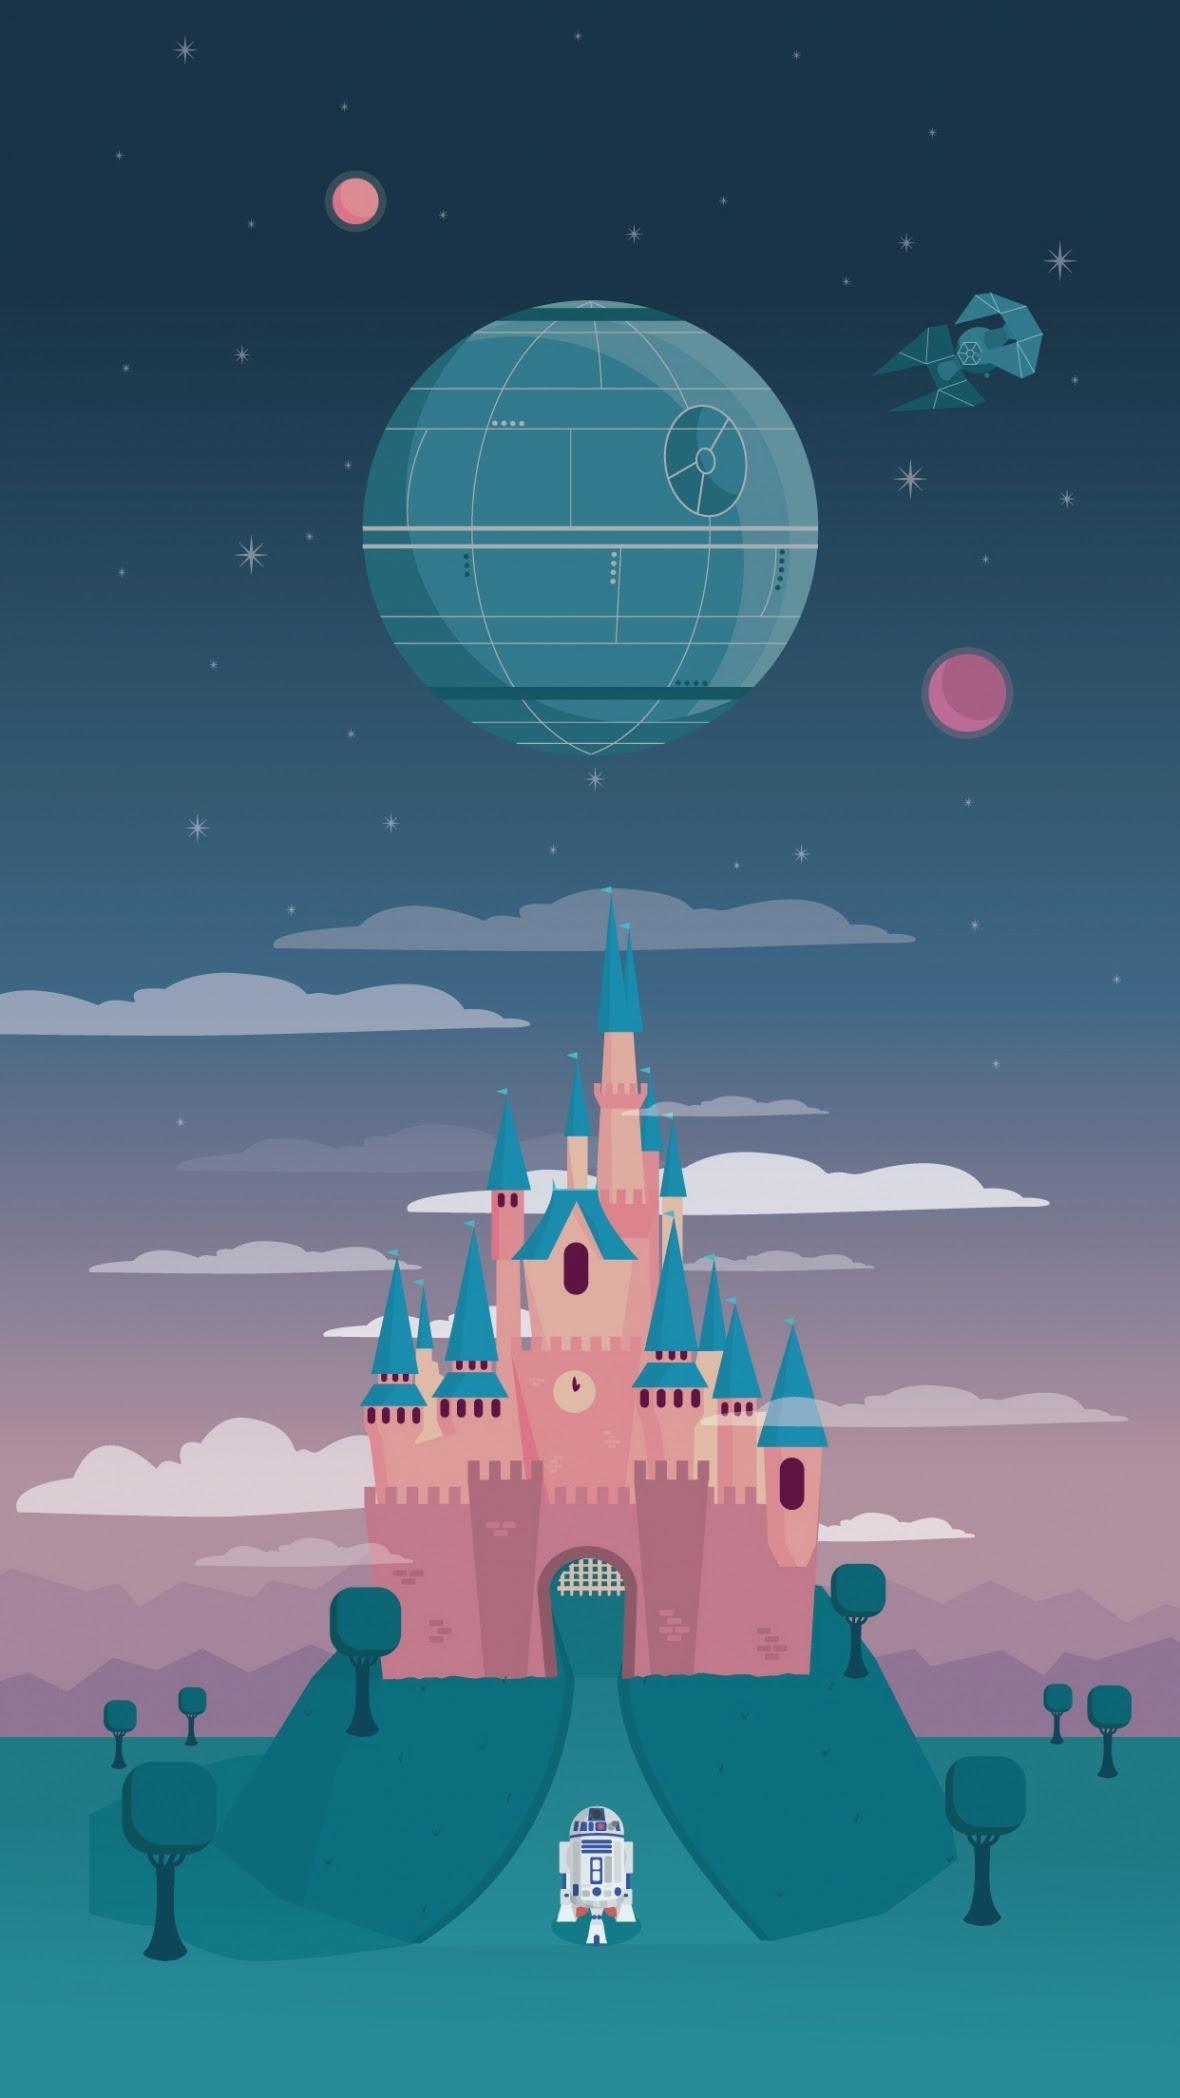 Wallpaper Wallpaper Iphone Tumblr Disney Monster Inc